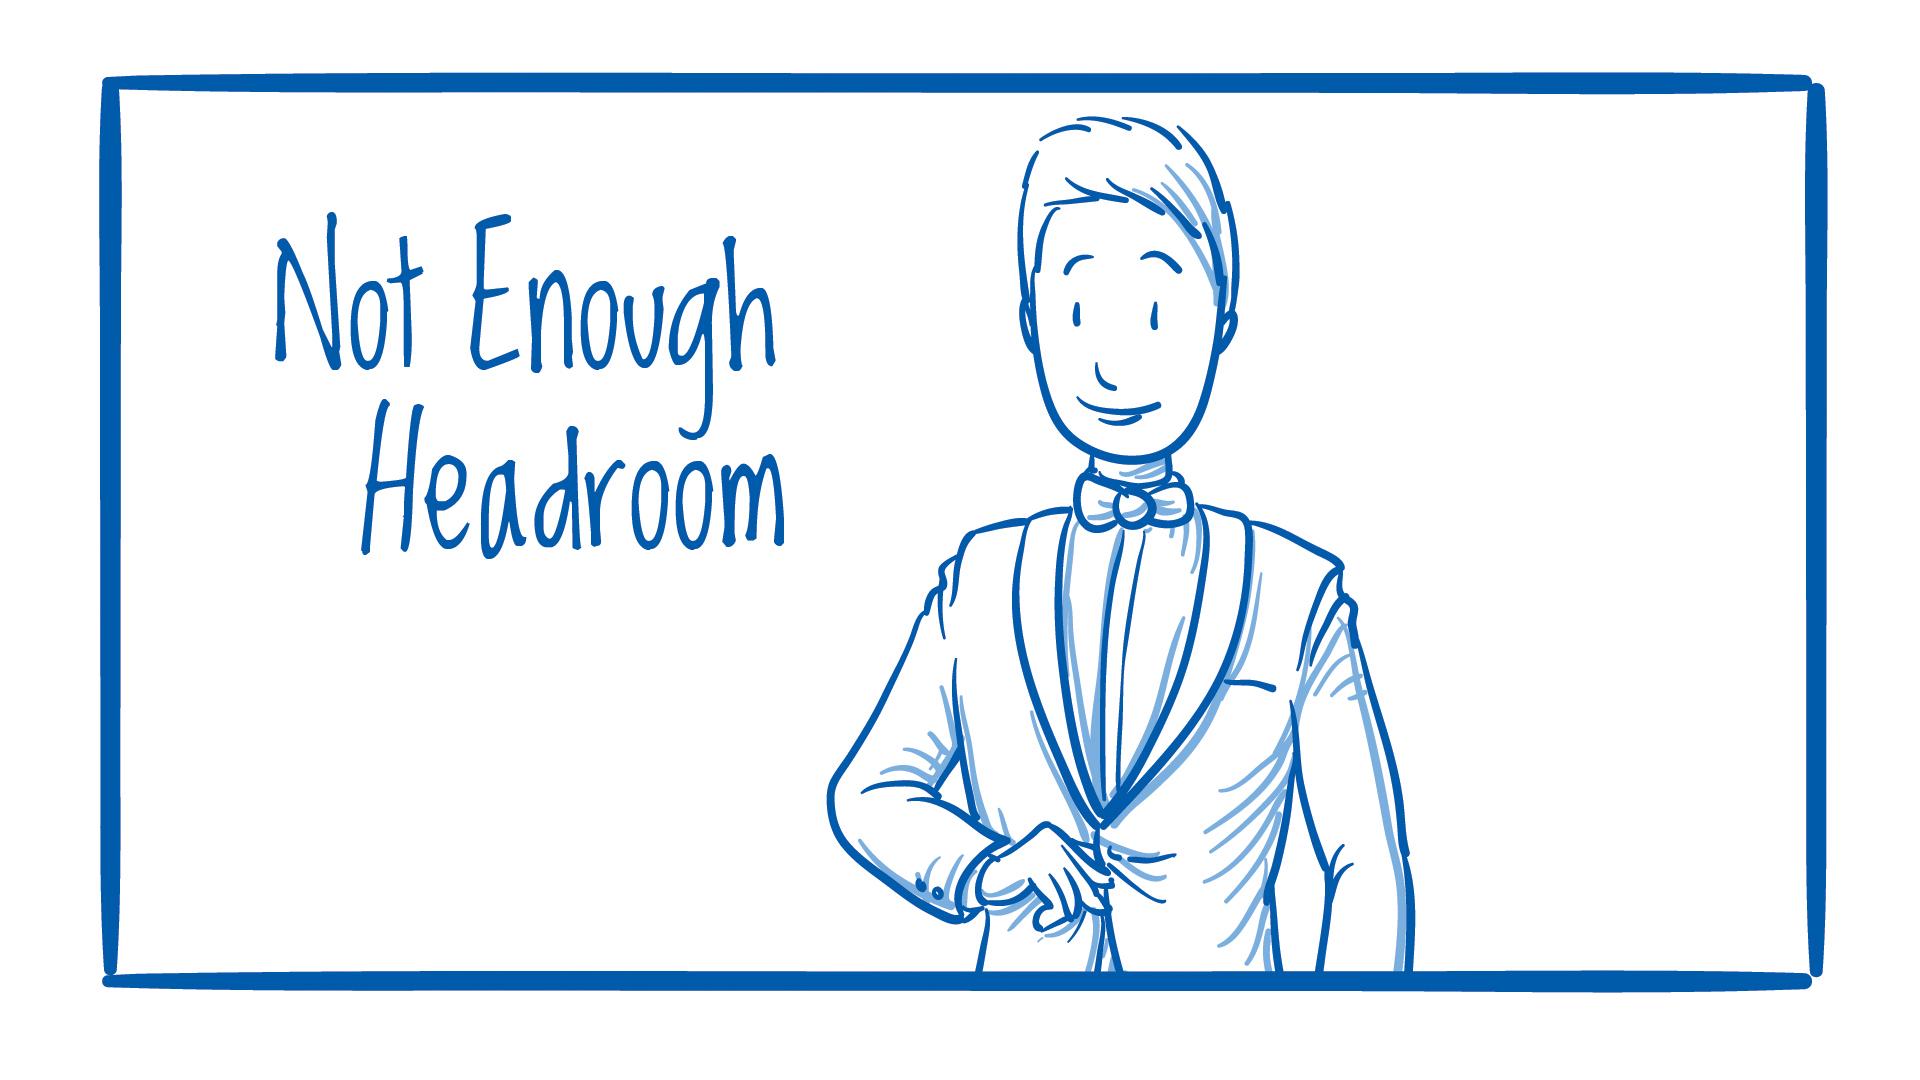 Too Much Headroom.jpg